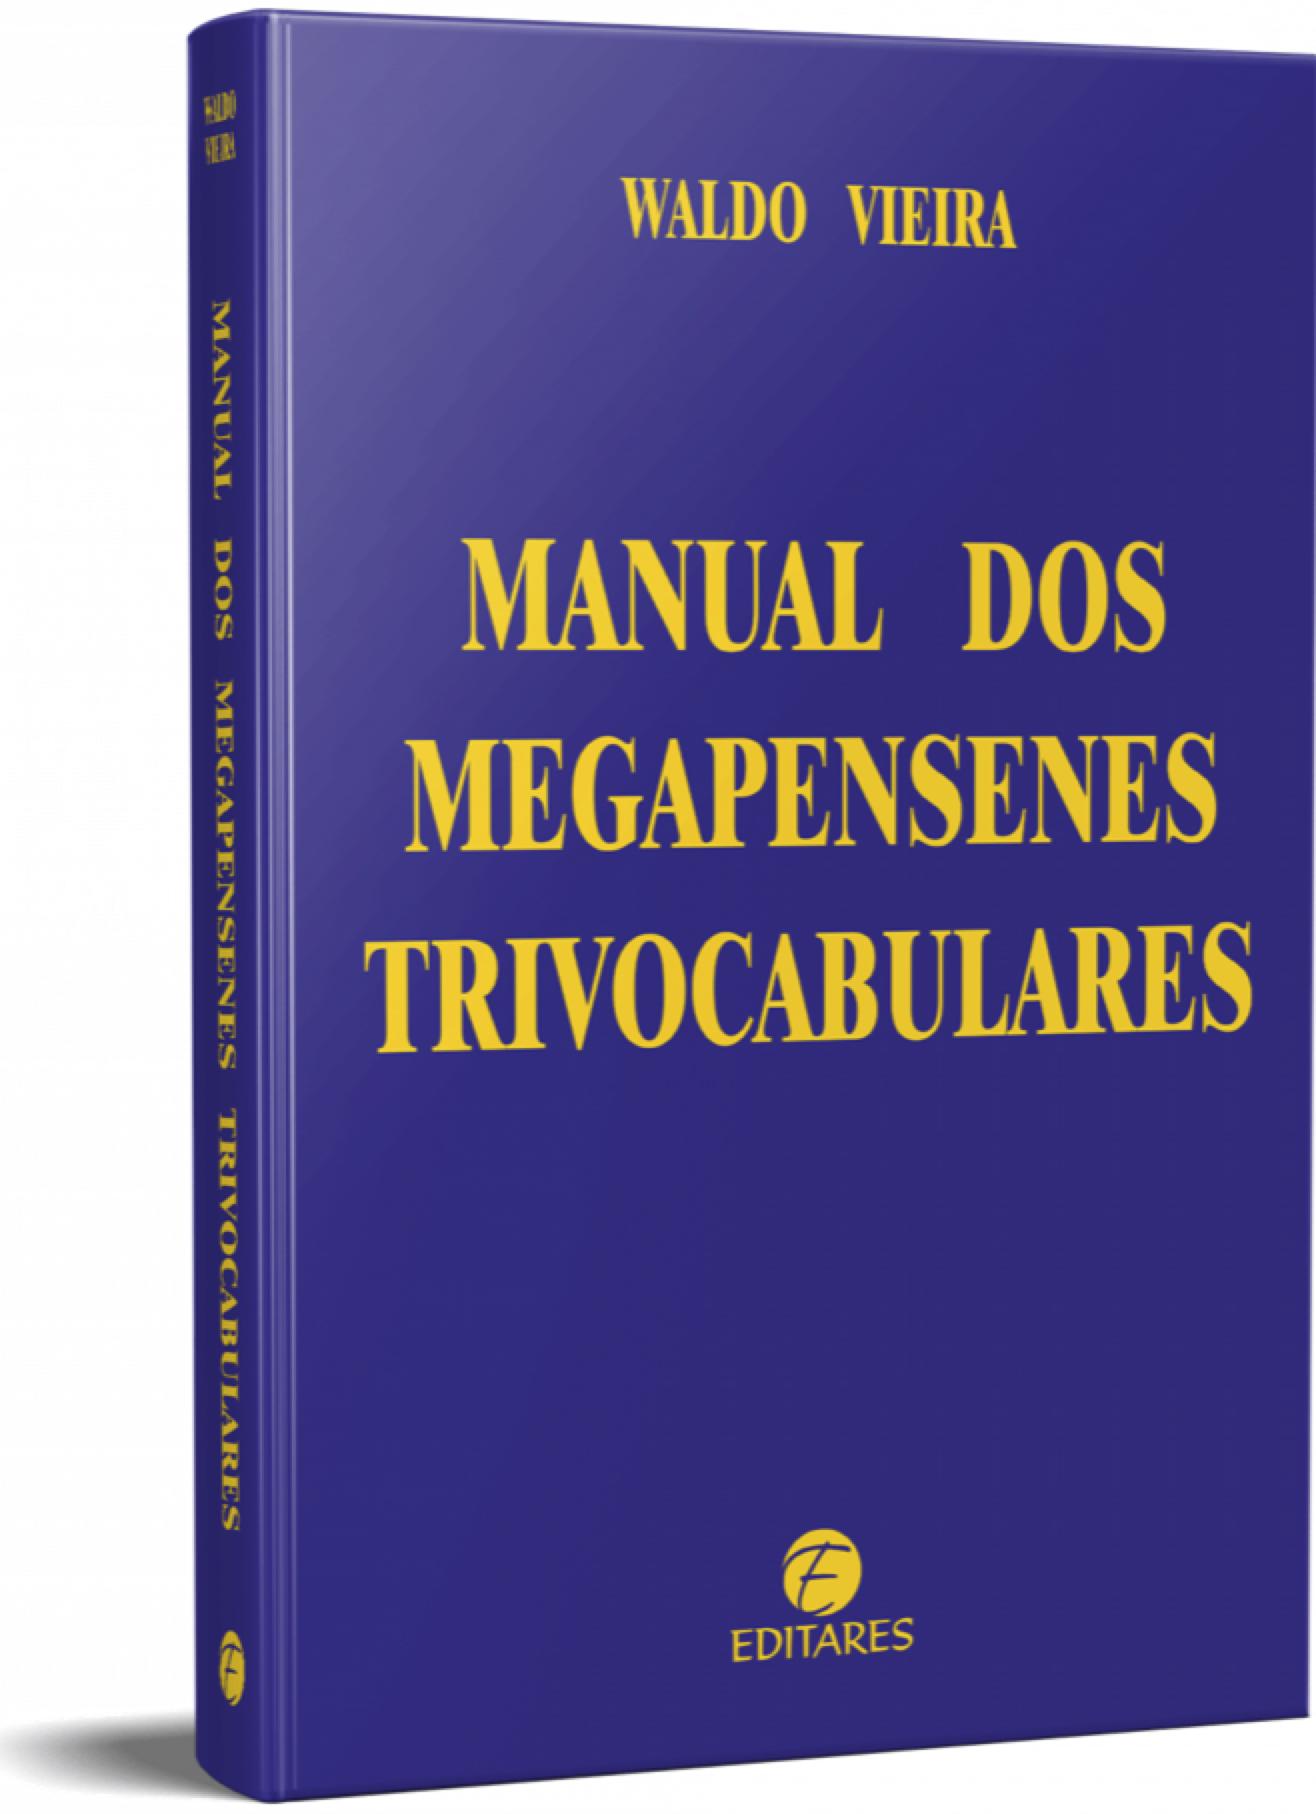 Manual dos Megapensenes Trivocabulares